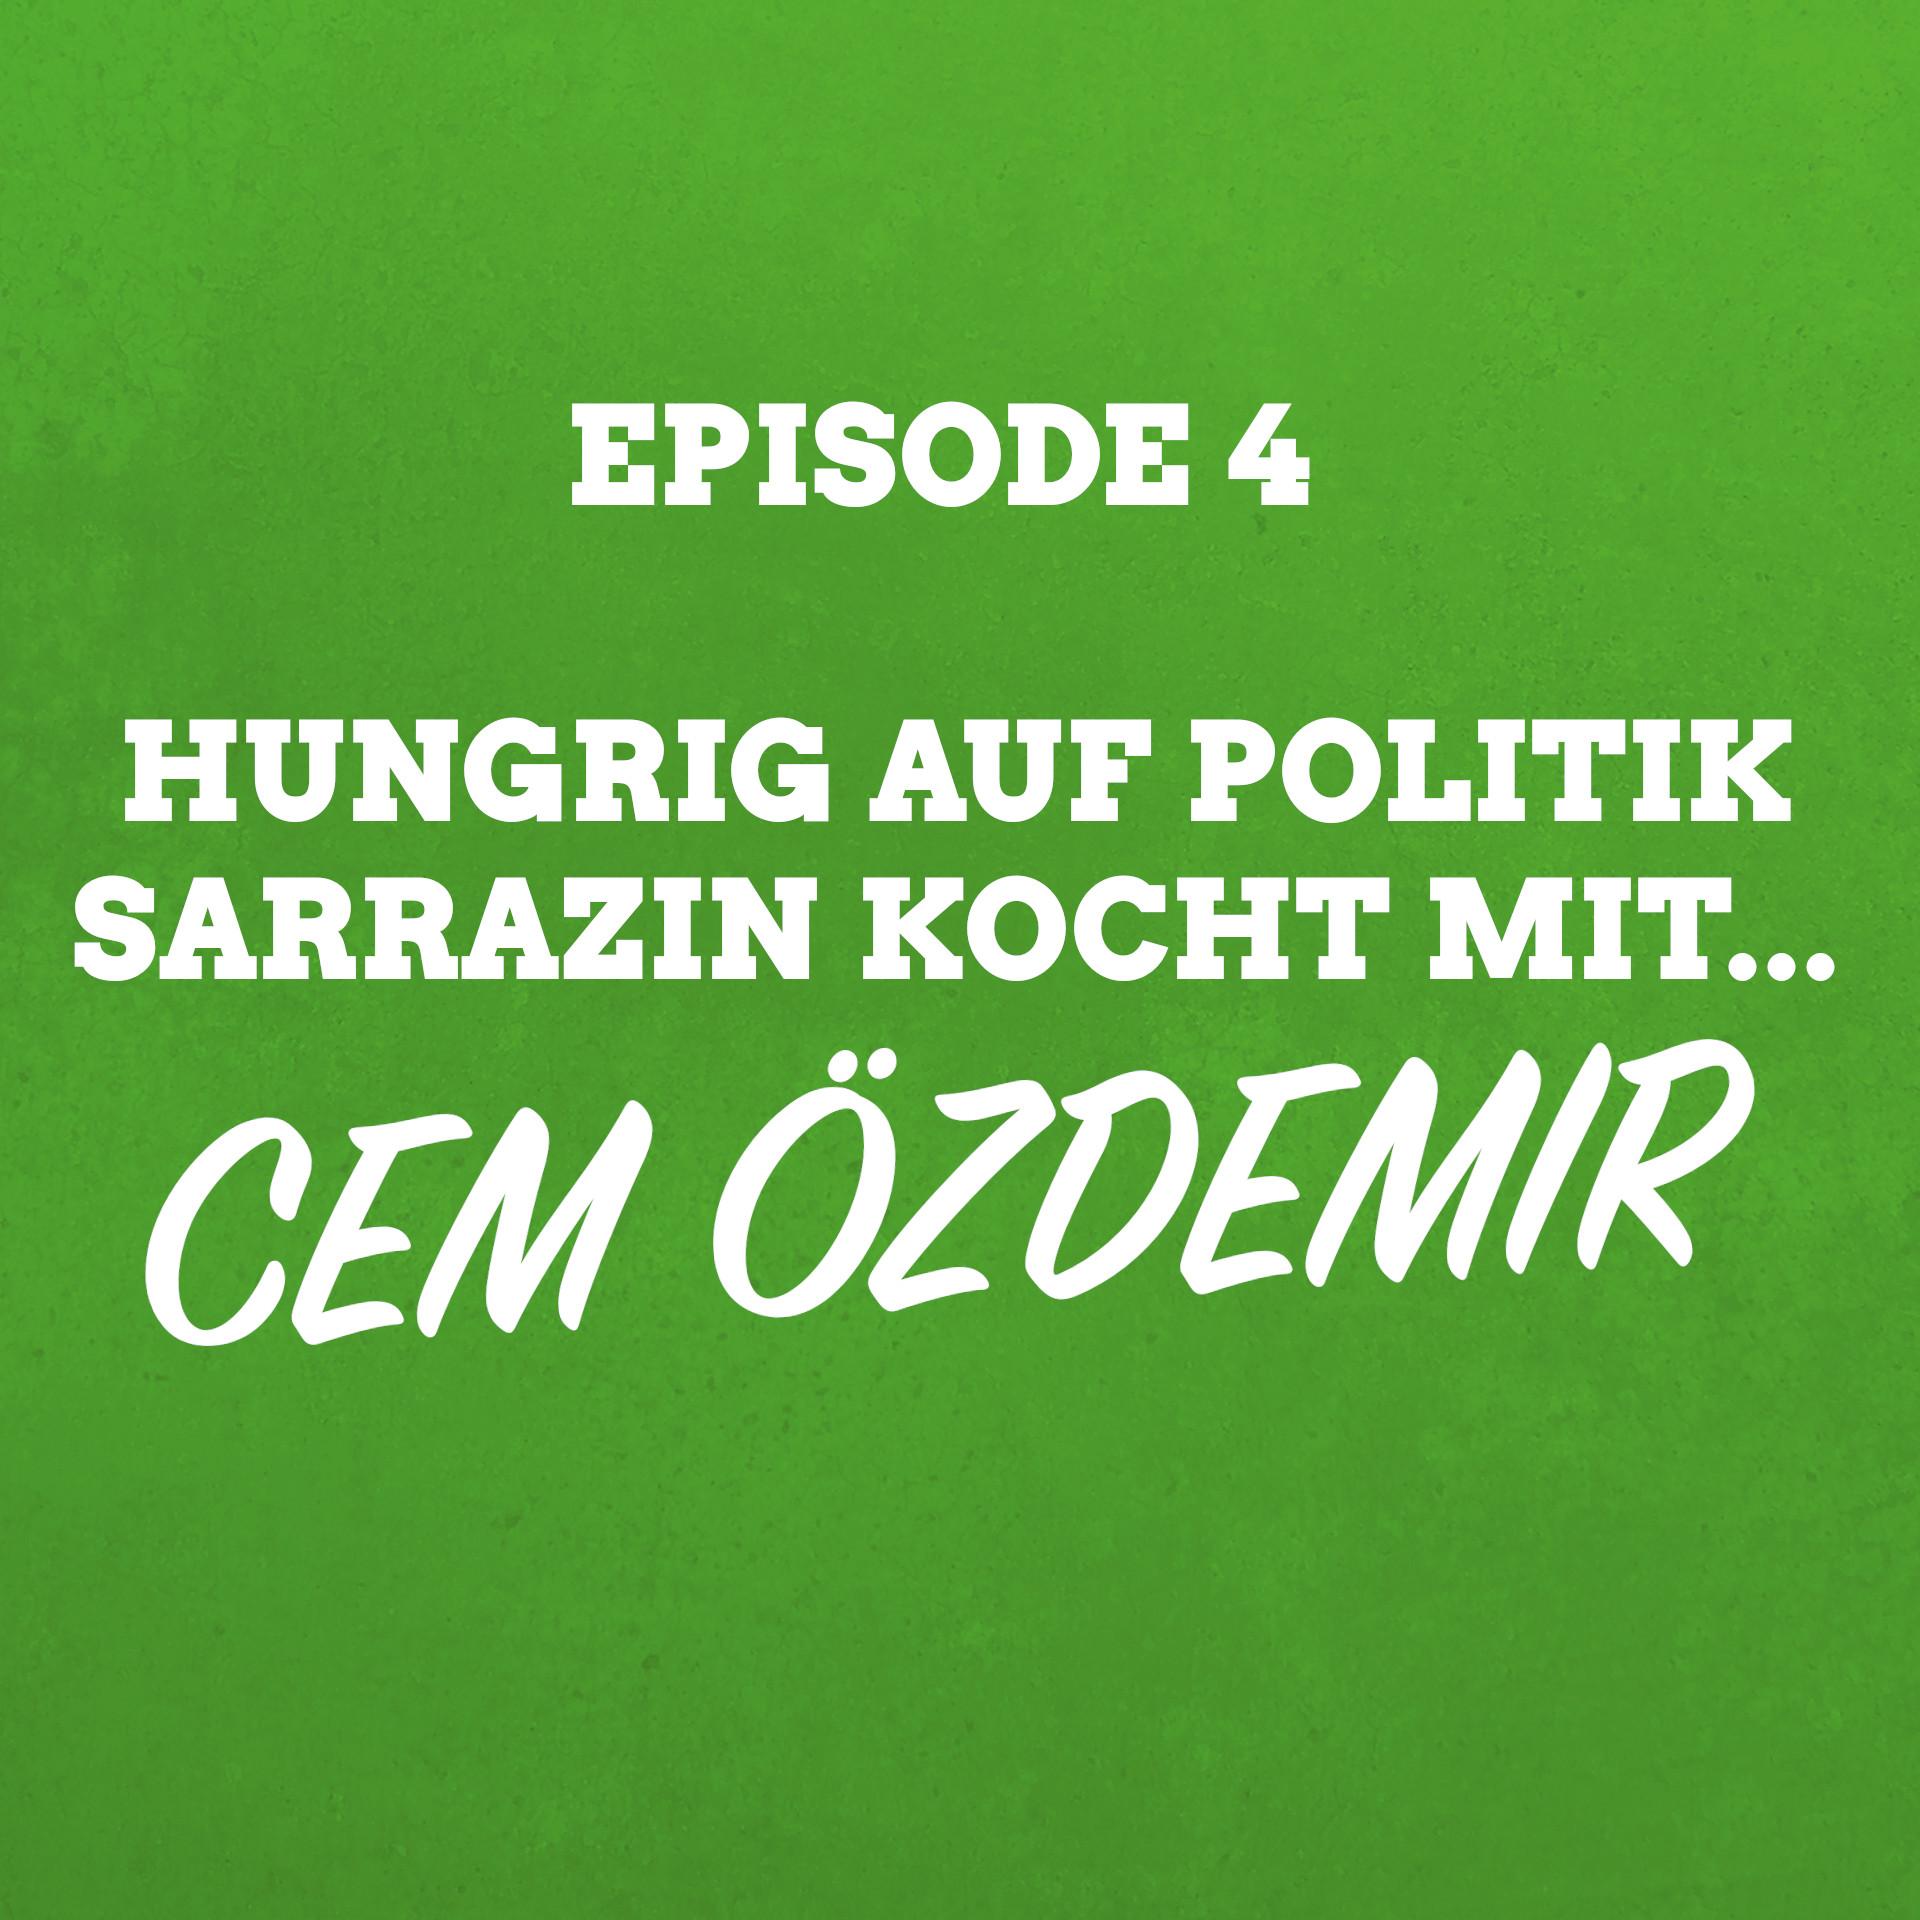 Hungrig auf Politik